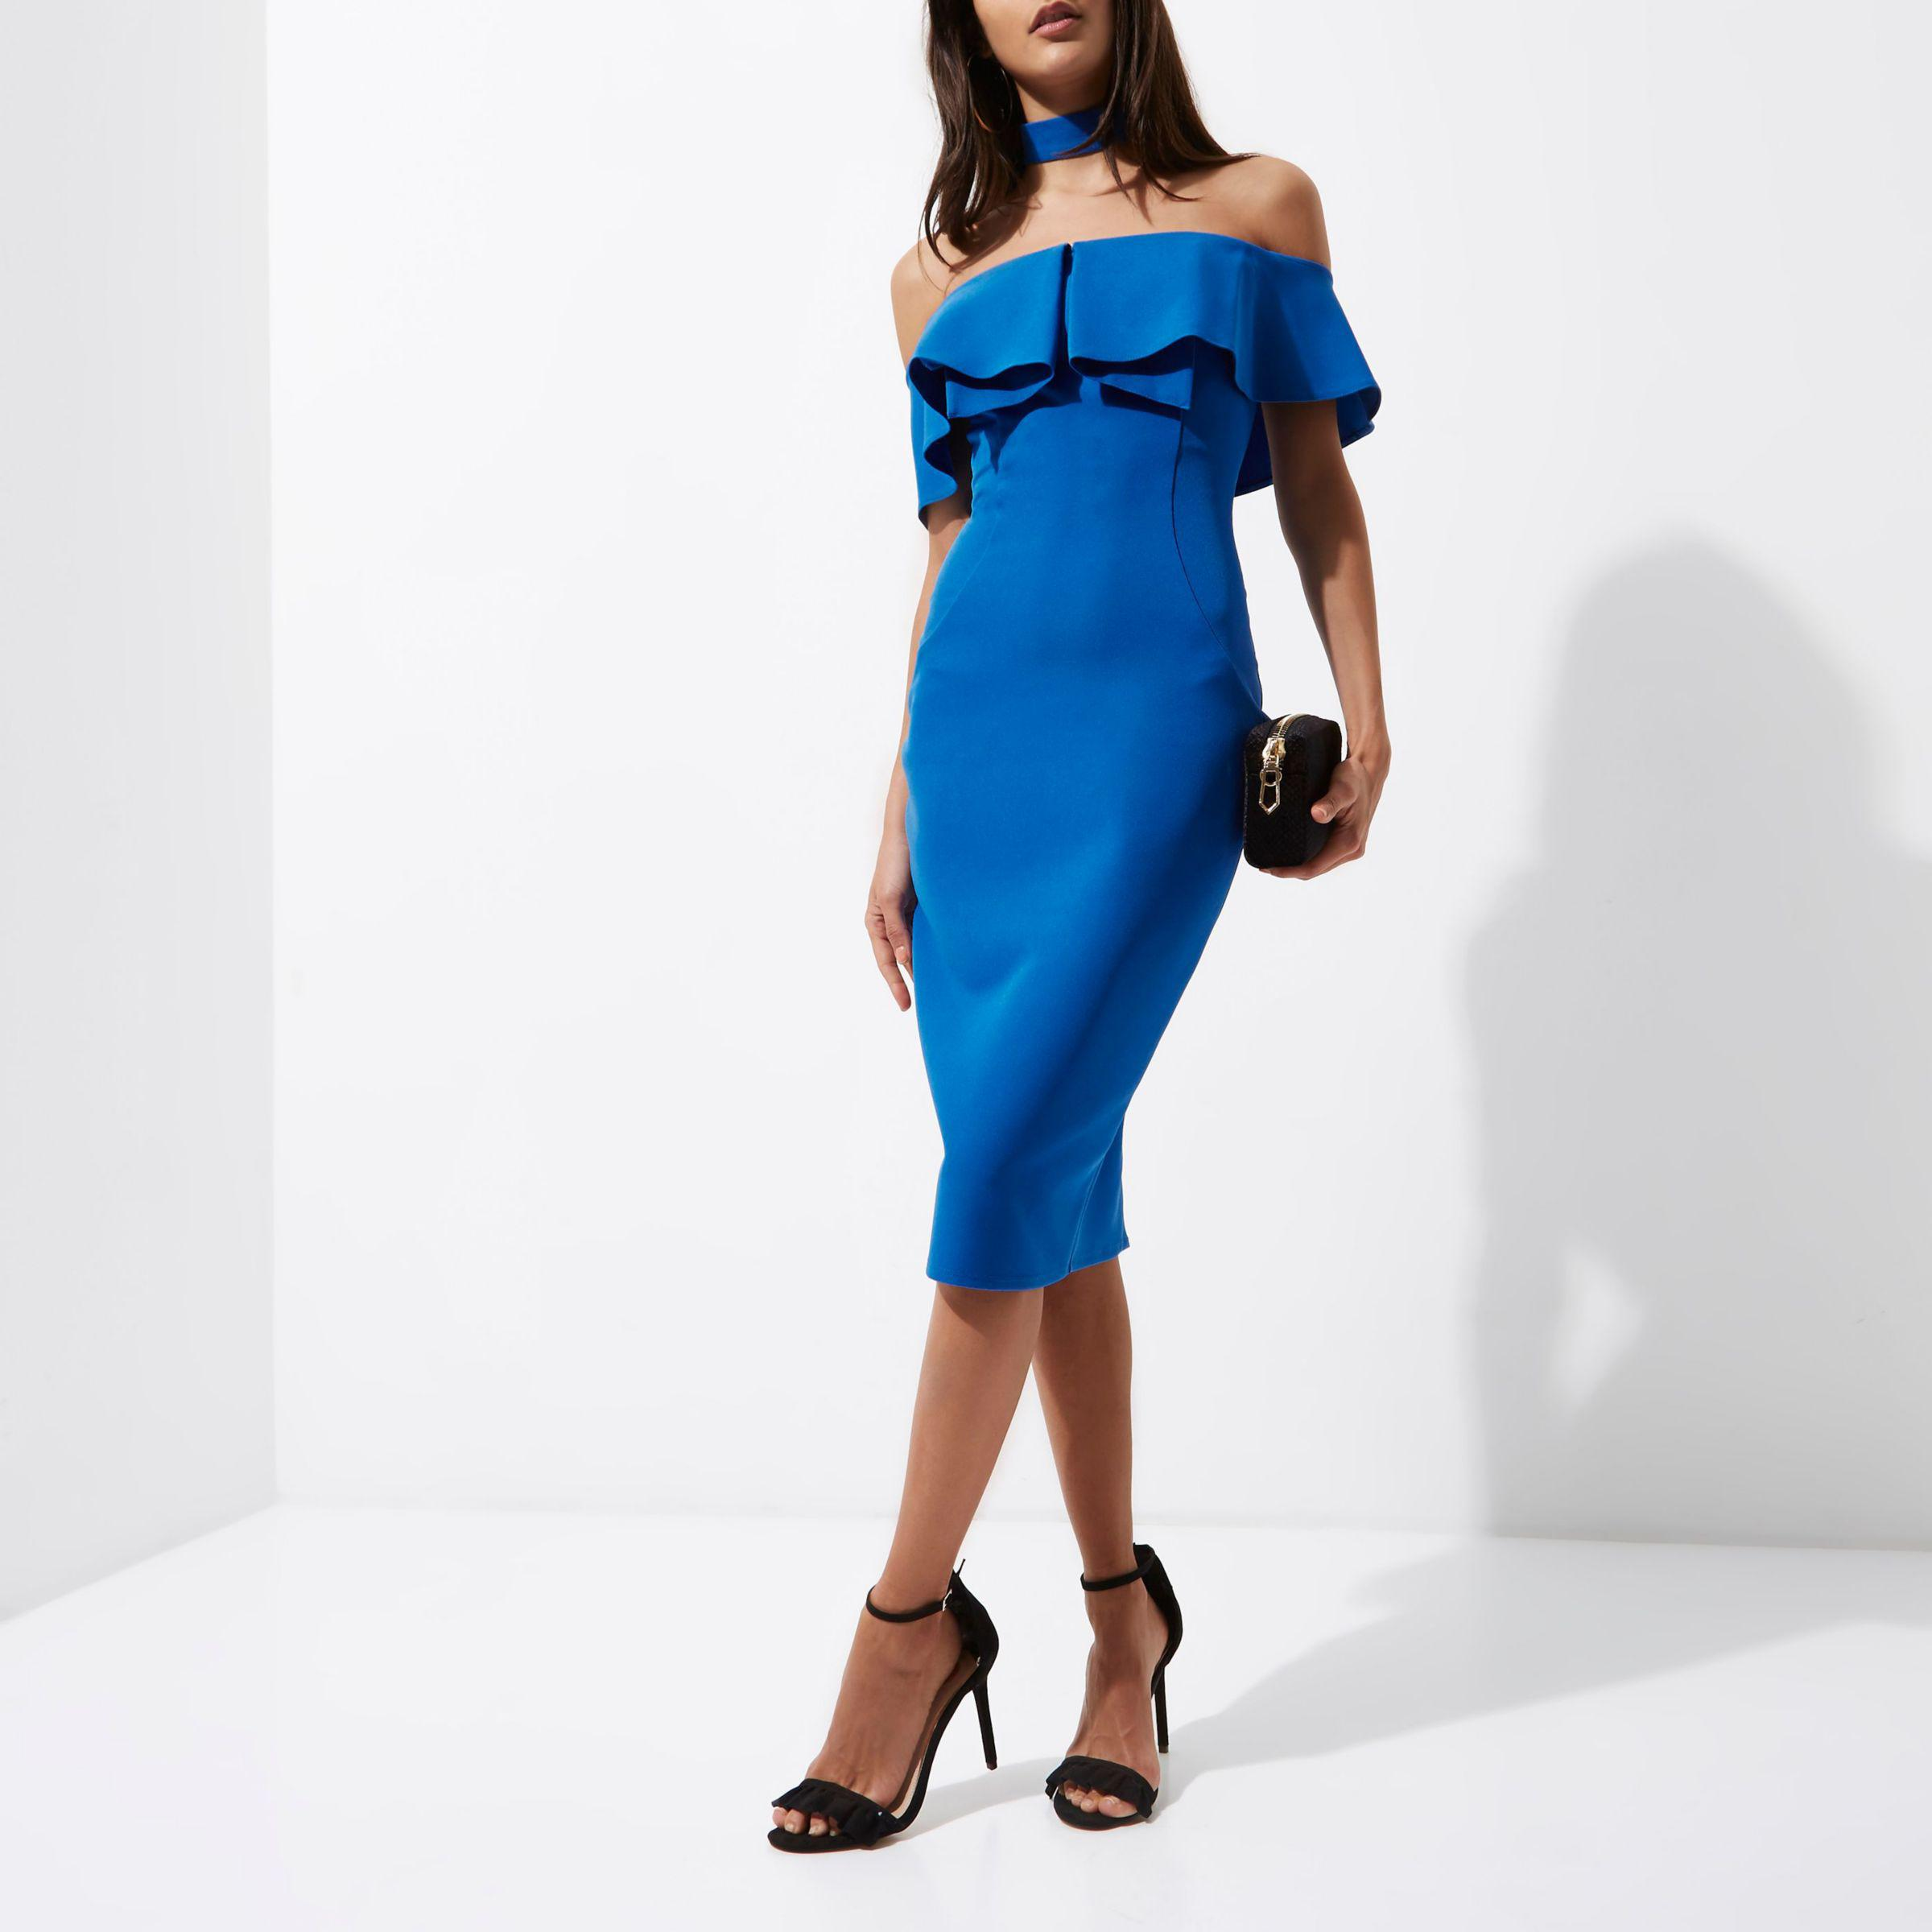 941c44e9da16 River Island Blue Choker Bardot Bodycon Midi Dress in Blue - Lyst